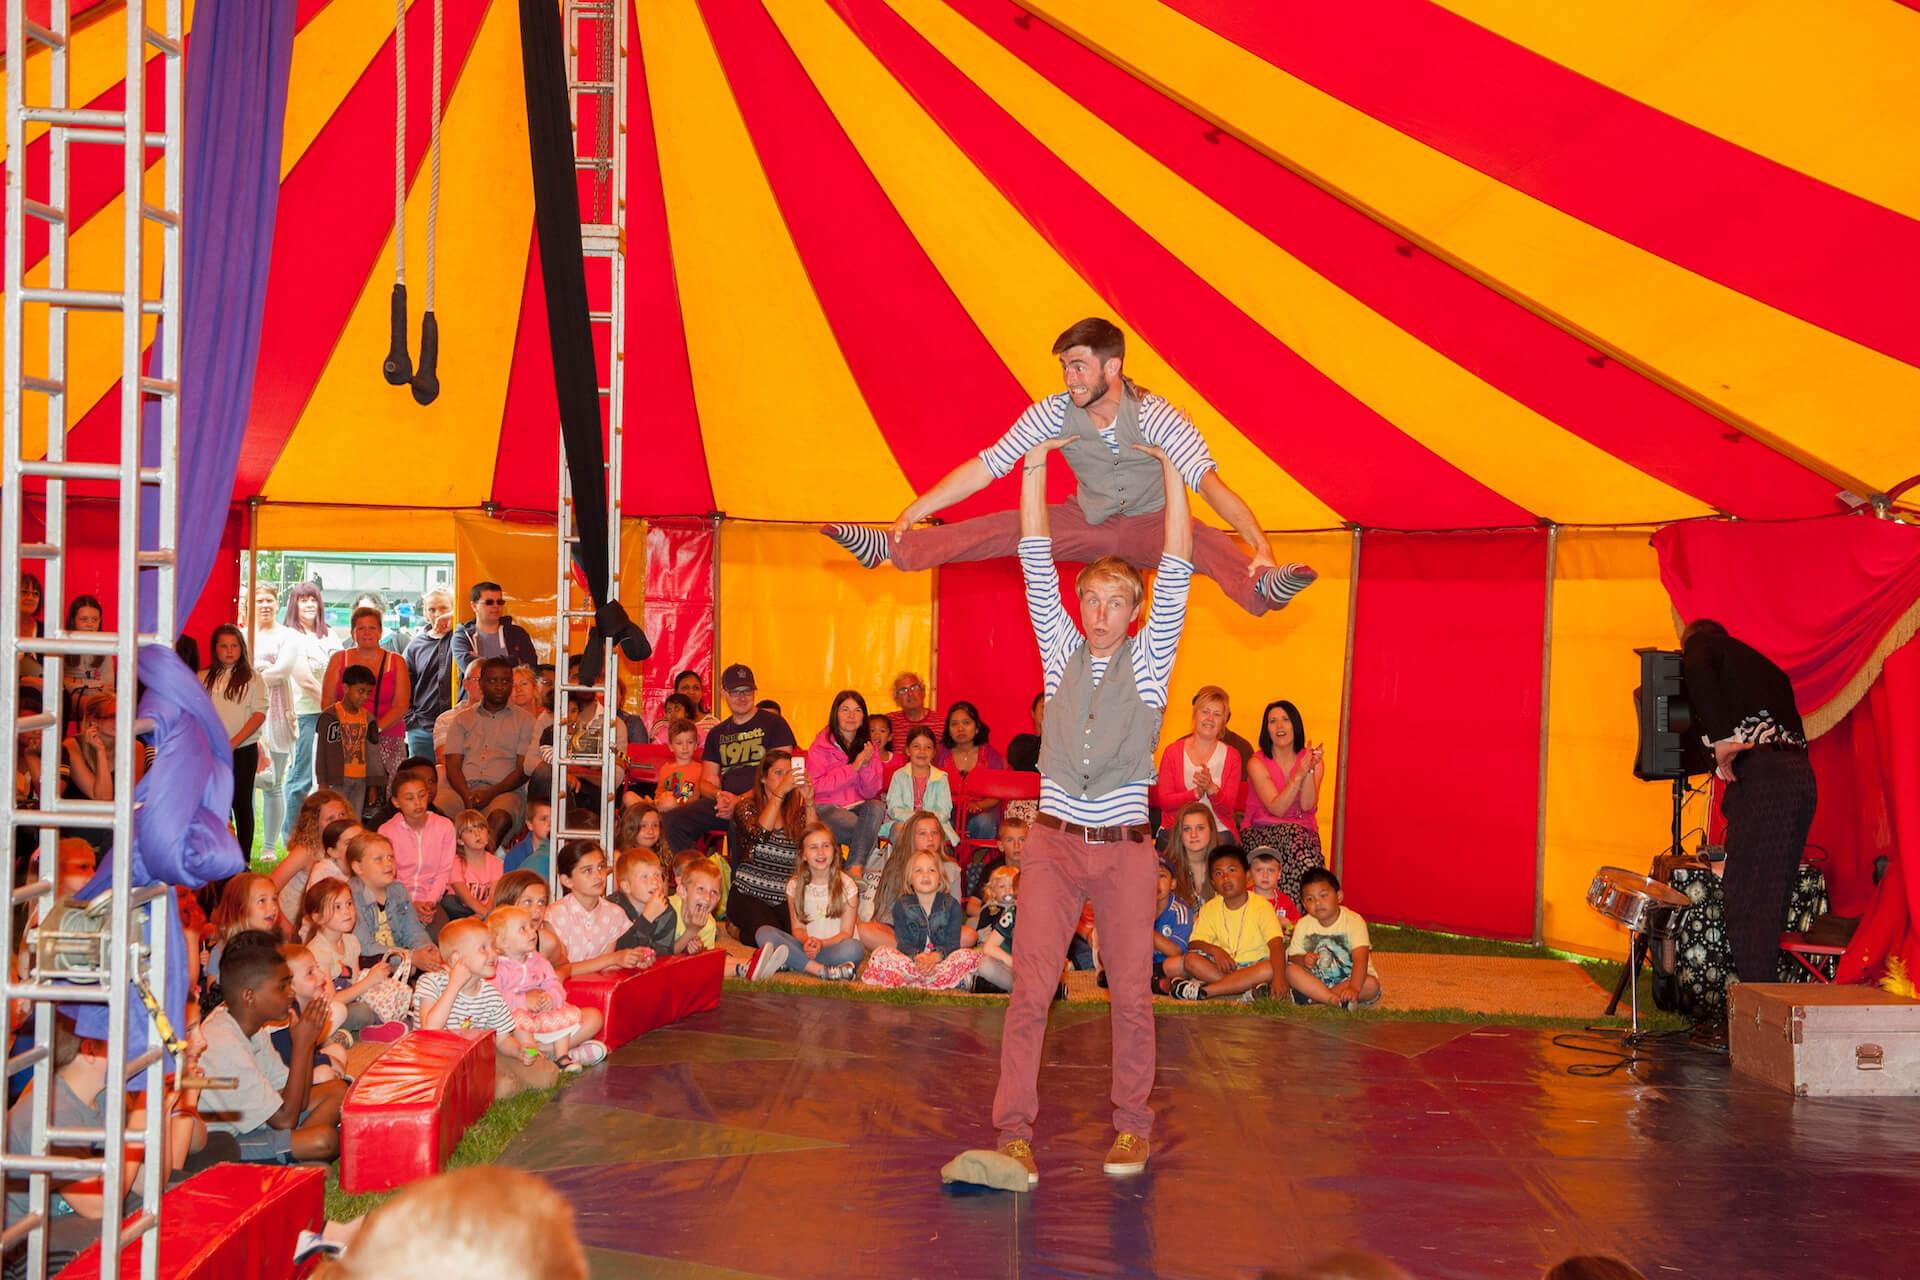 Acrobats in circus show at Shamblala festival